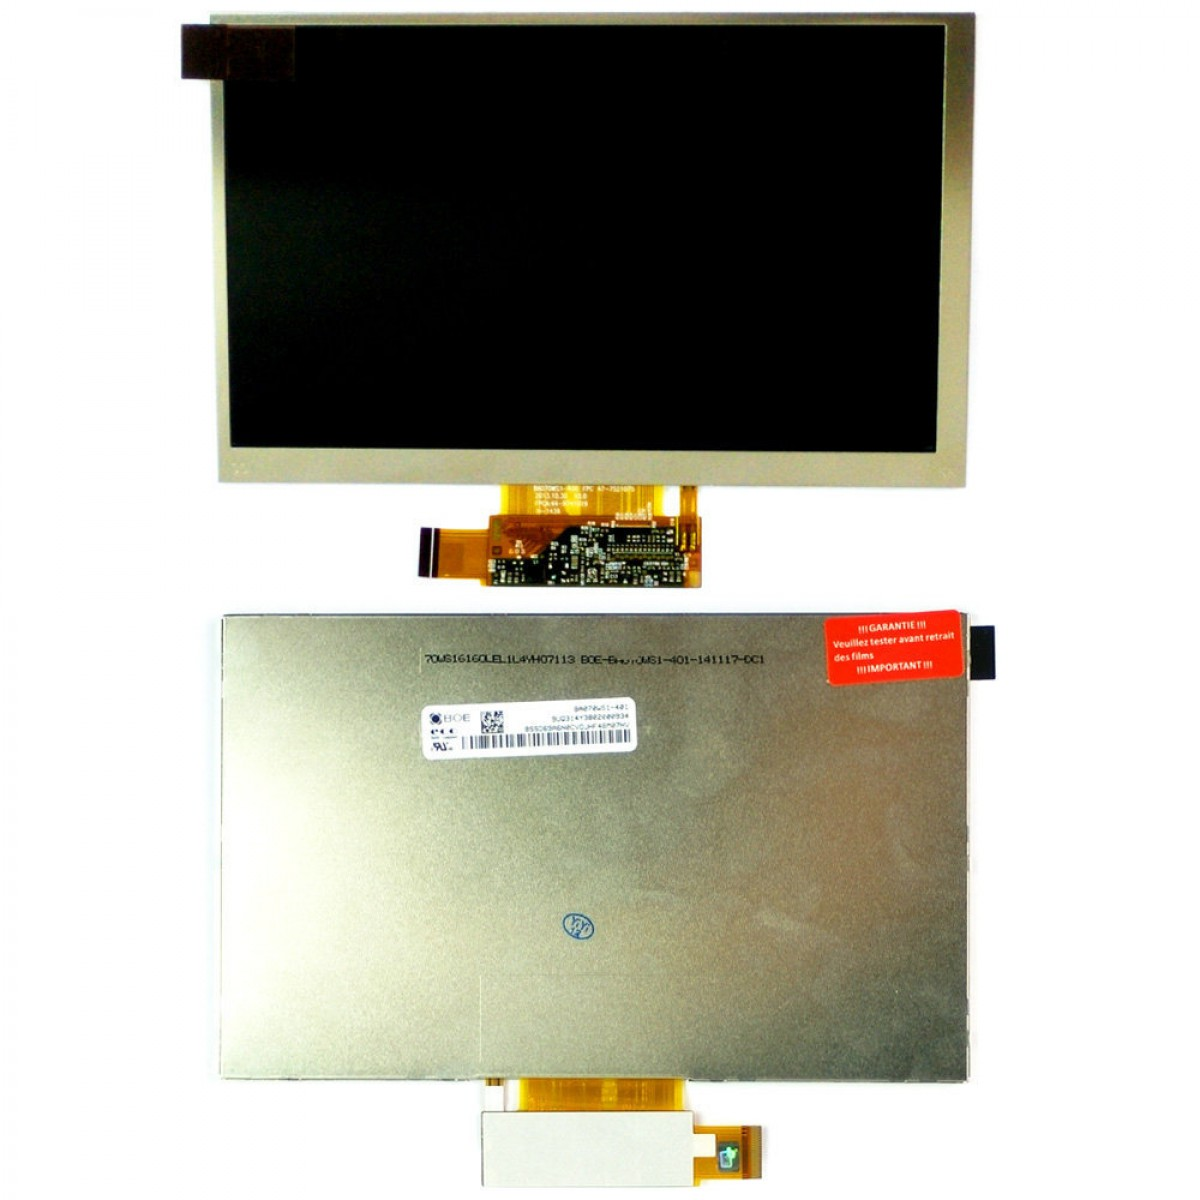 afficheur lcd samsung galaxy tab 3 lite 7 t110 t111 t113 achat en ligne sur lcd maroc. Black Bedroom Furniture Sets. Home Design Ideas